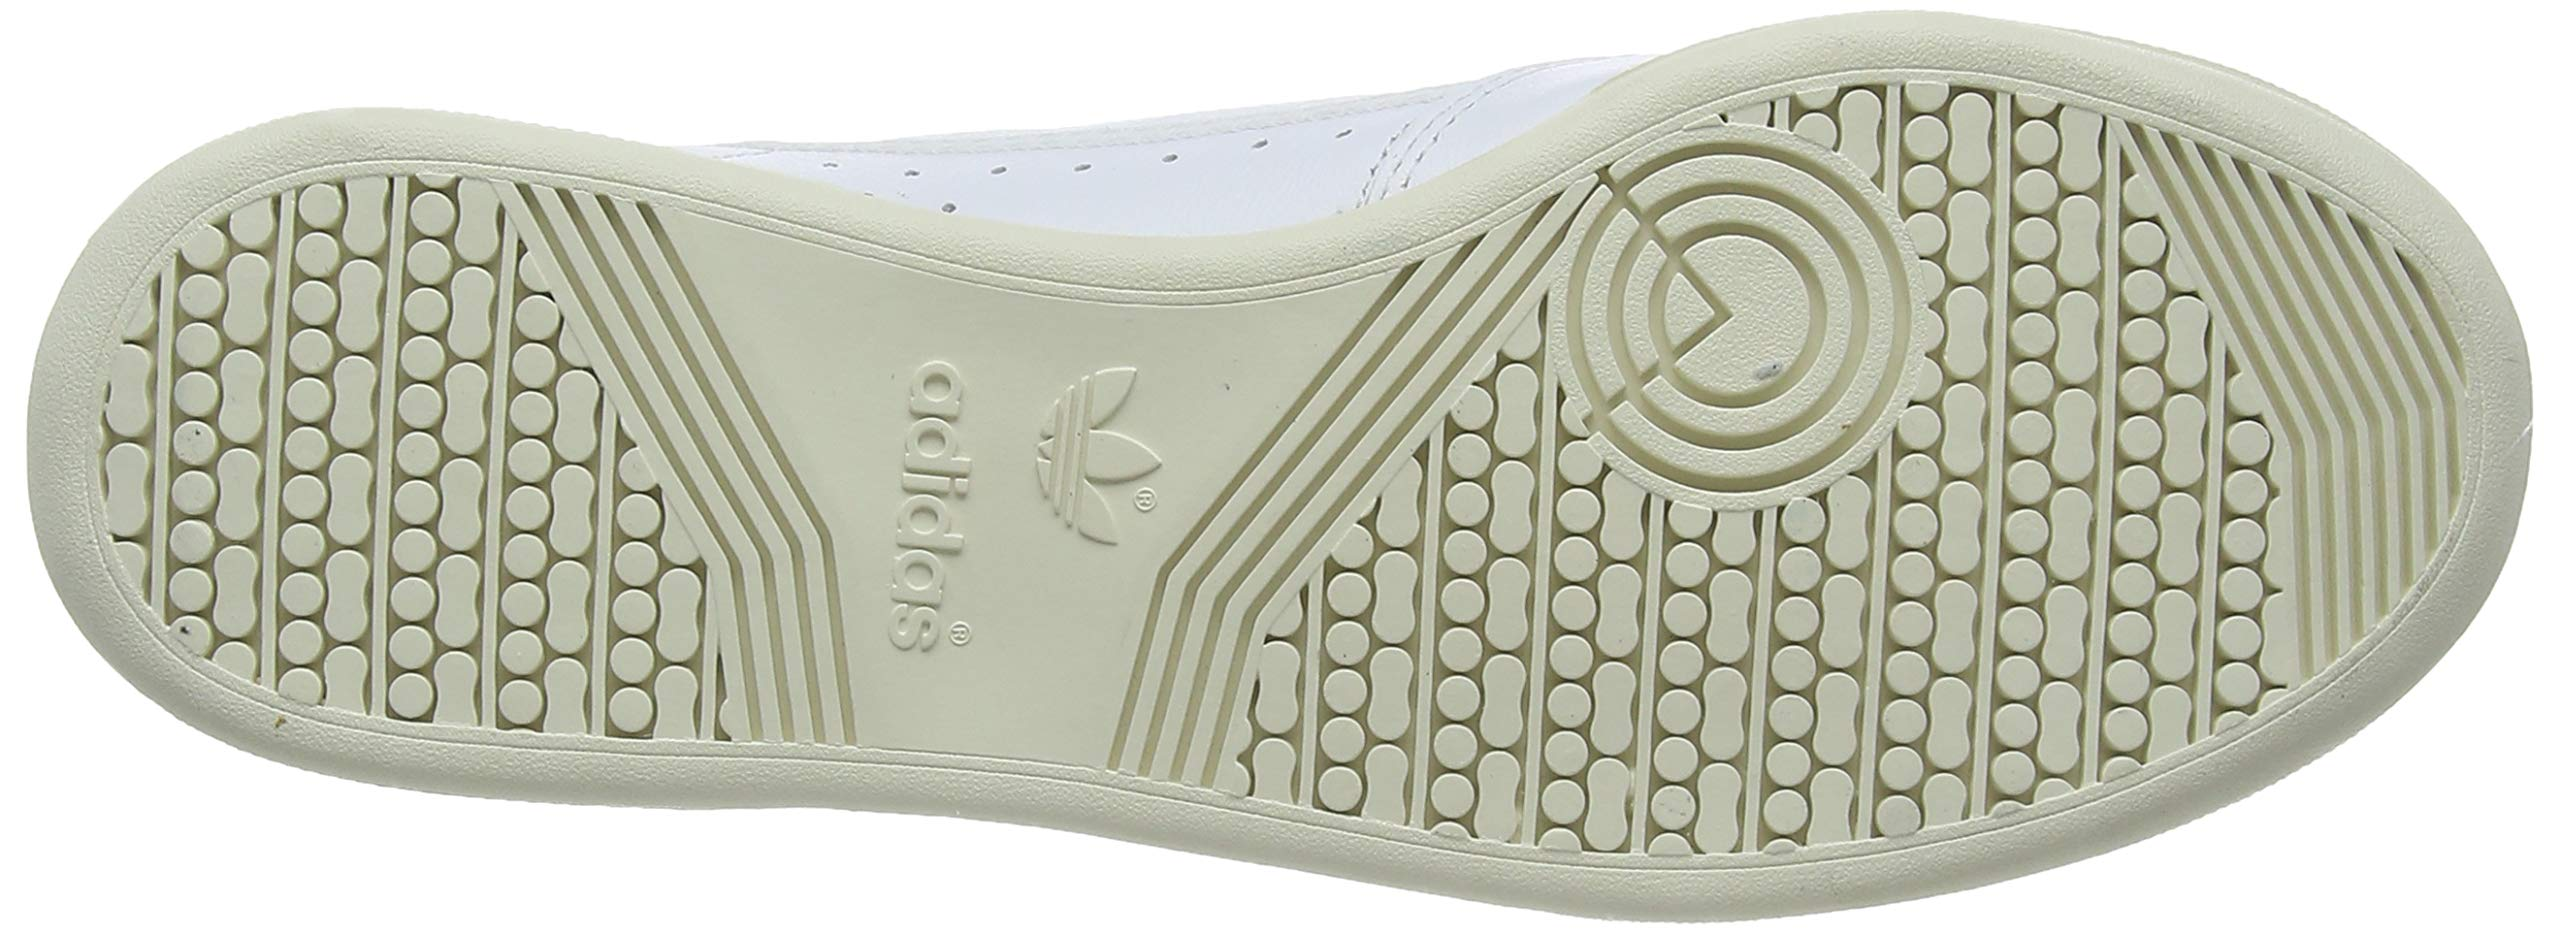 adidas Continental, Scarpe da Ginnastica Basse Uomo, OS 3 spesavip